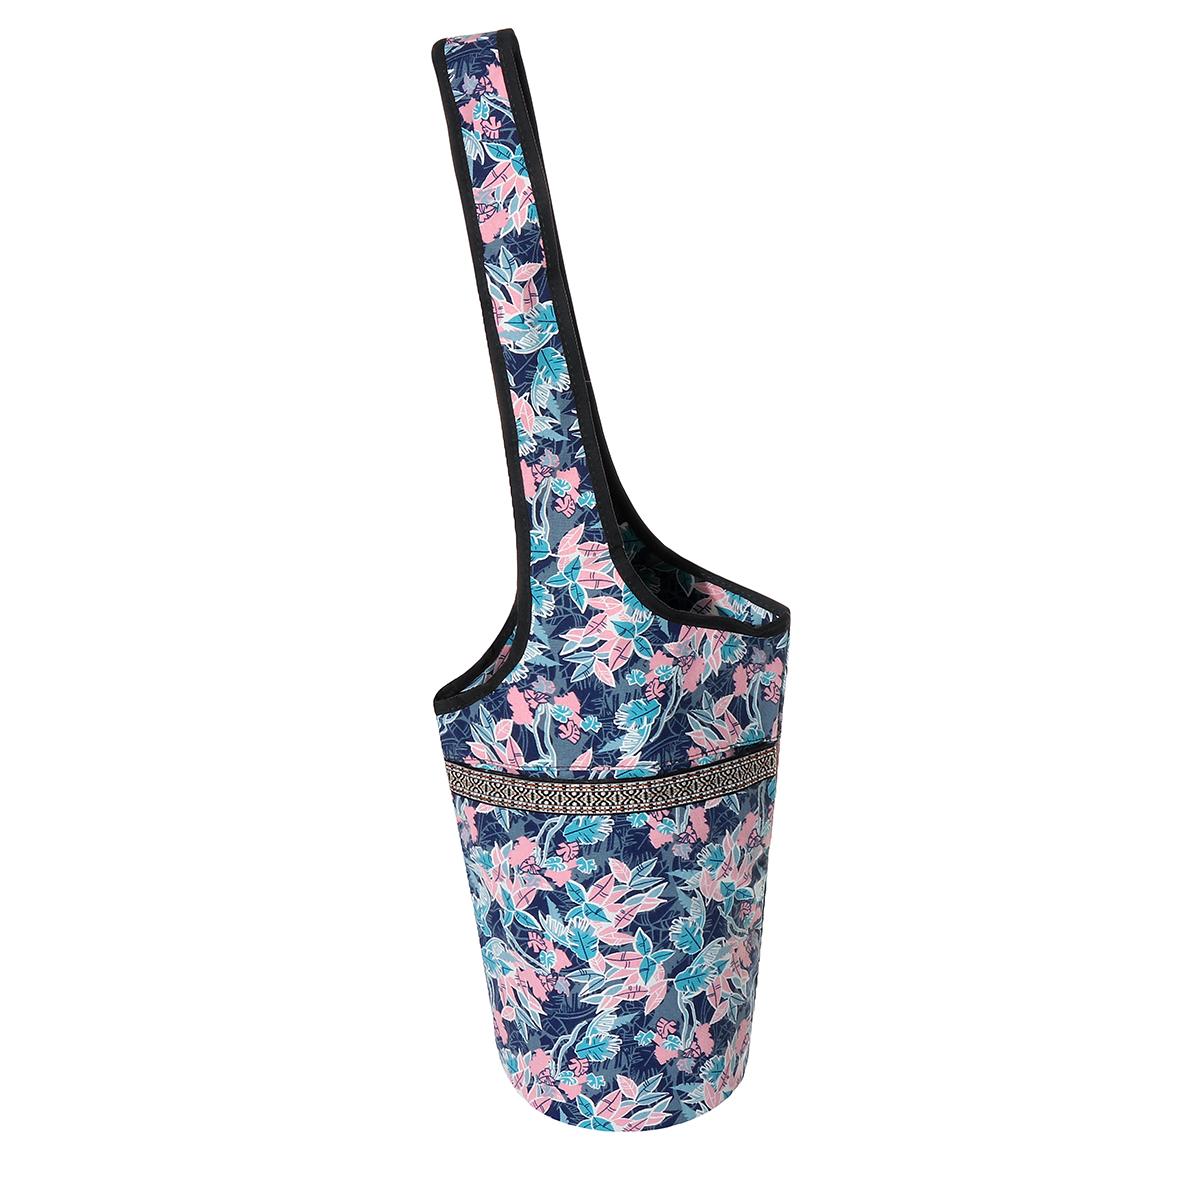 Fashion Printed Canvas Yoga Bag With Large Capacity Pocket Fit Most Yoga Mats